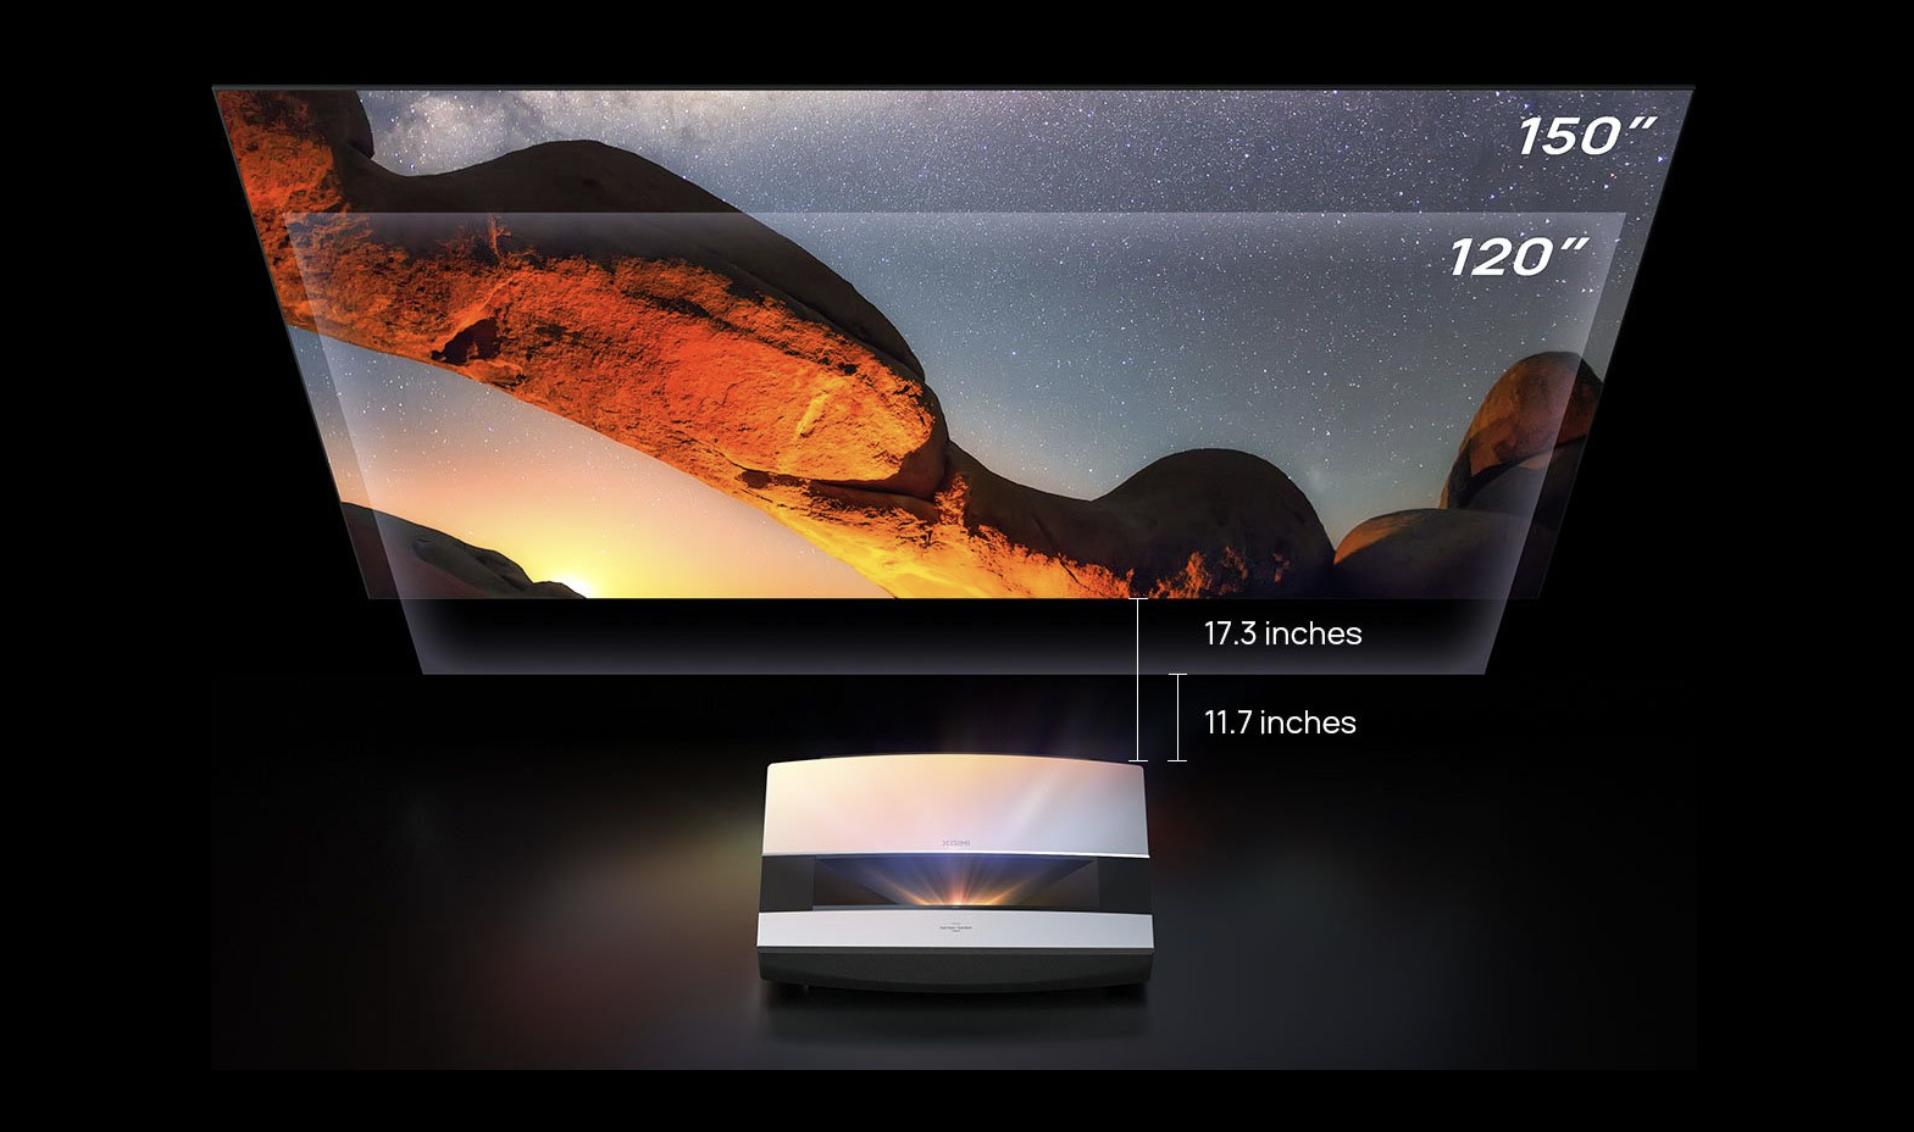 XGIMI Announces Their First Ultra Short-Throw Projector, Aura 2